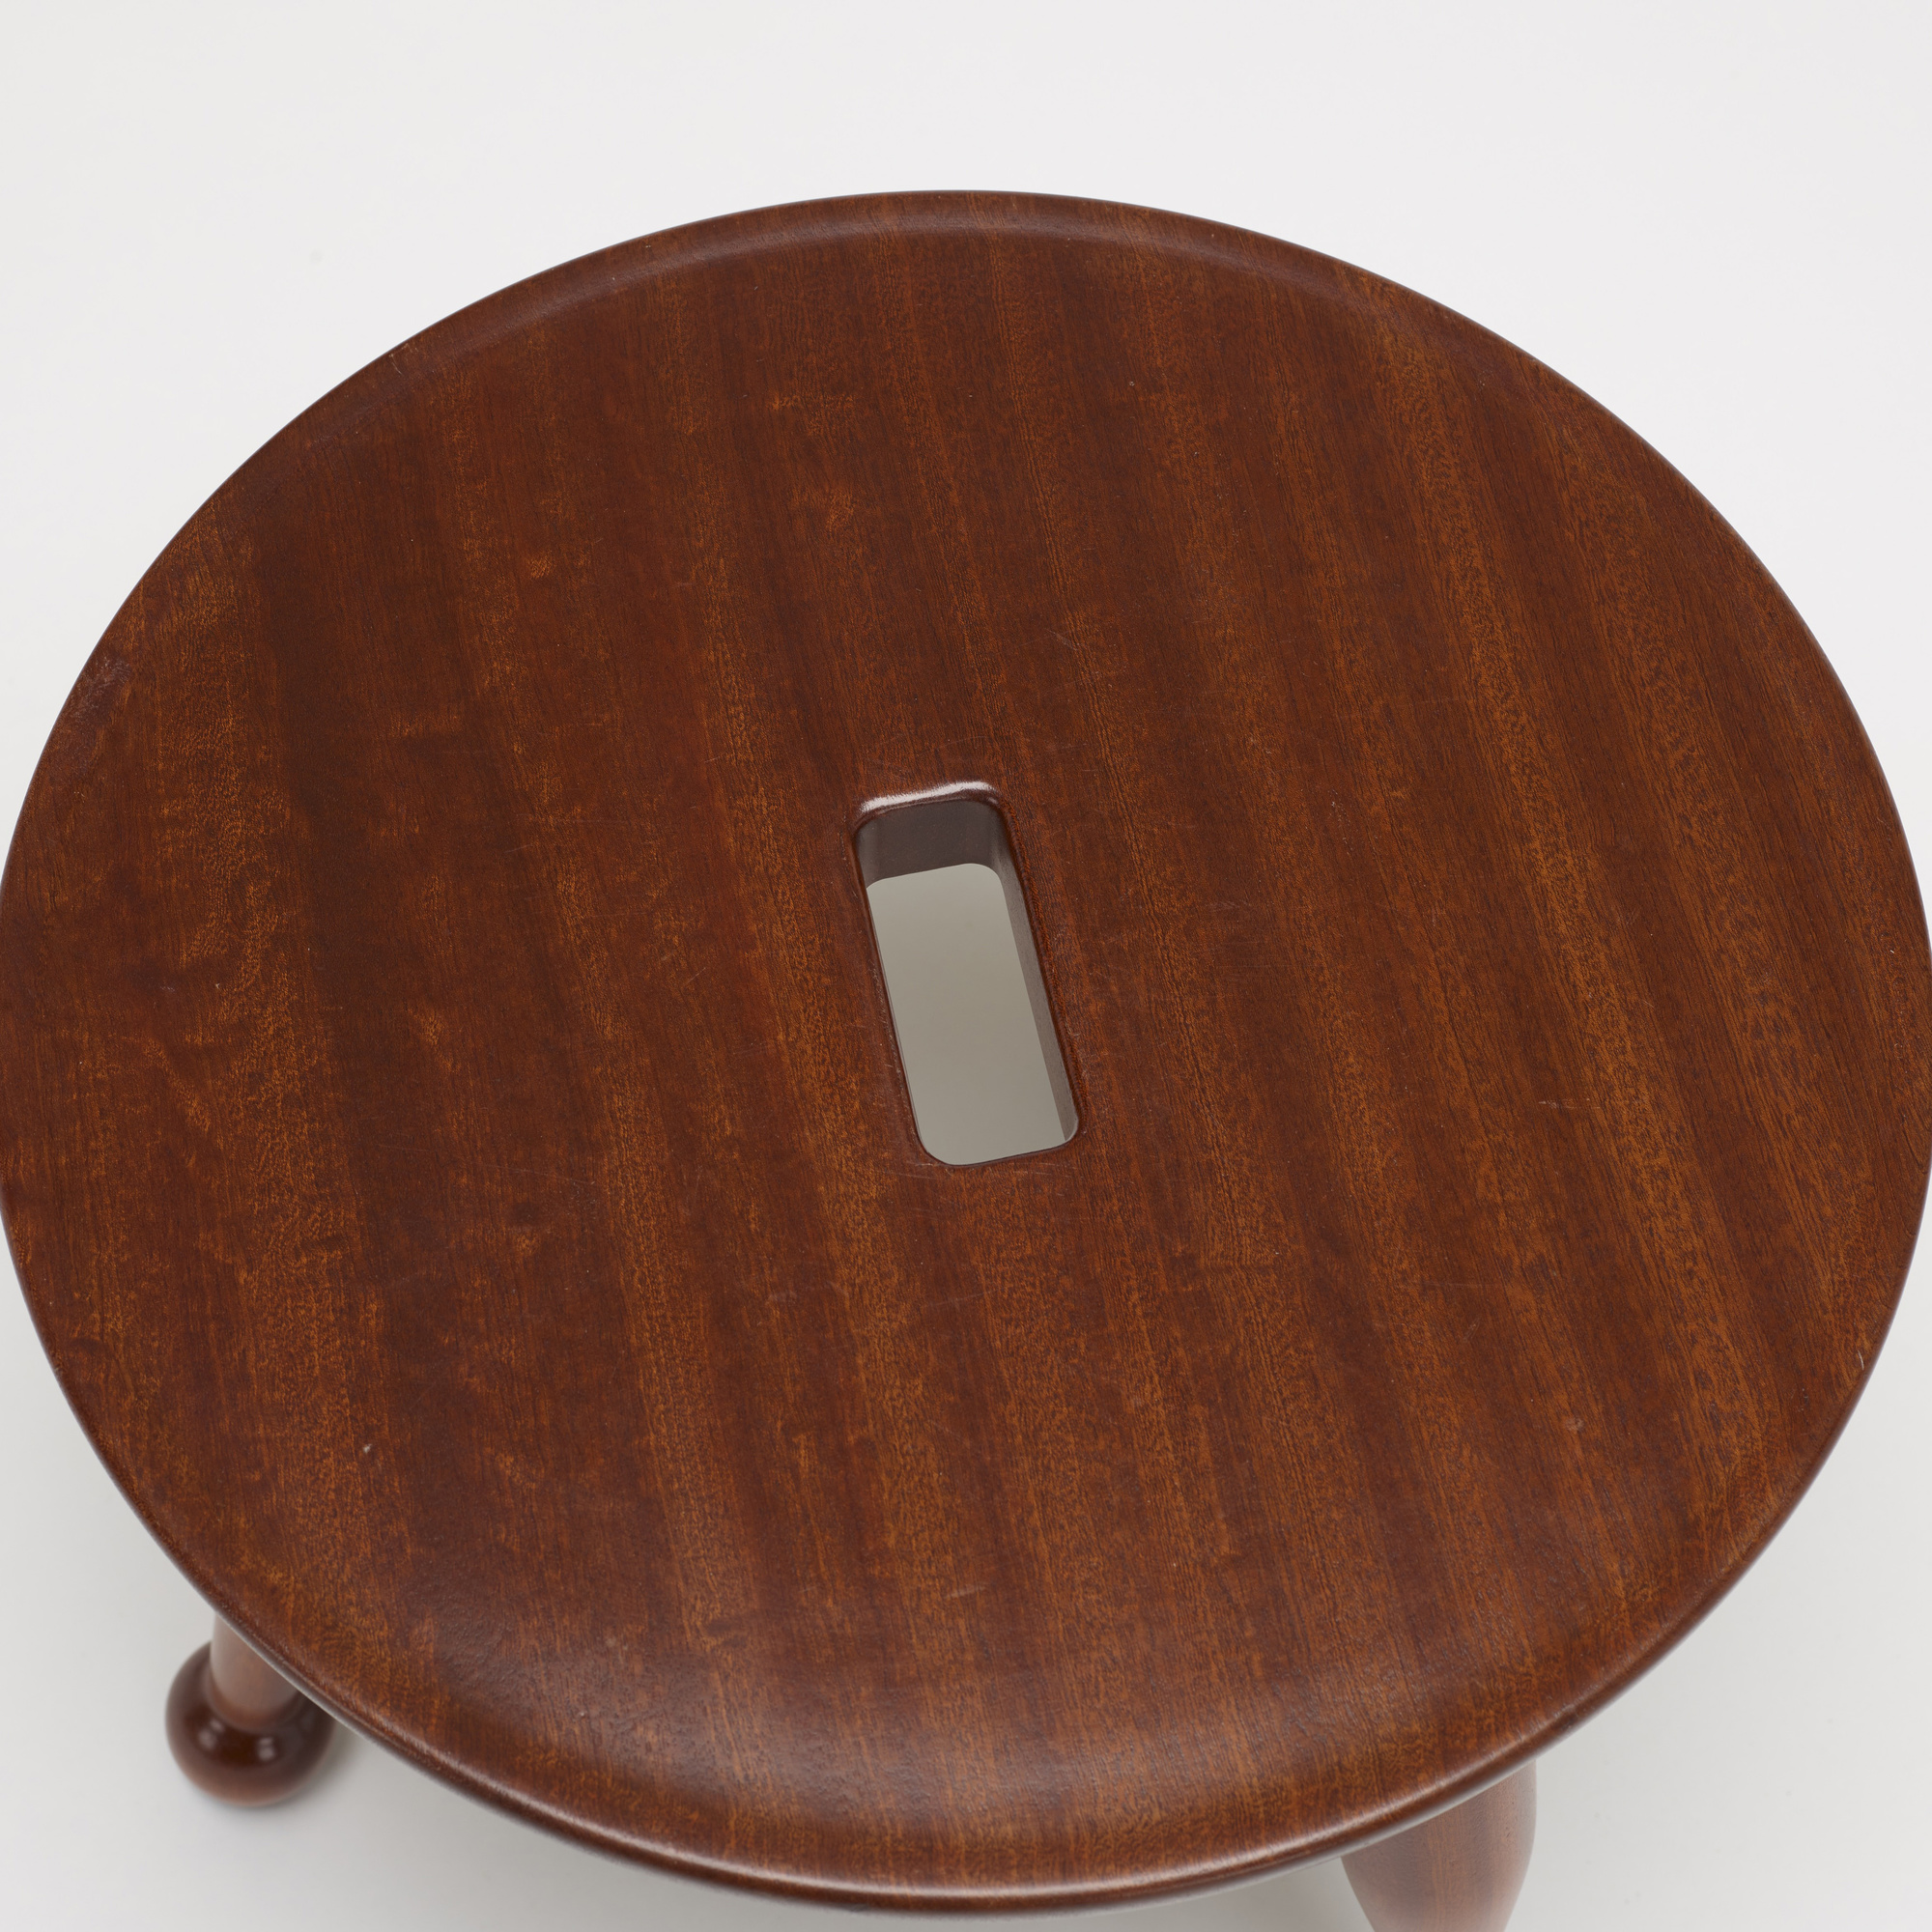 287: Josef Frank / stool, model 2156 (2 of 2)